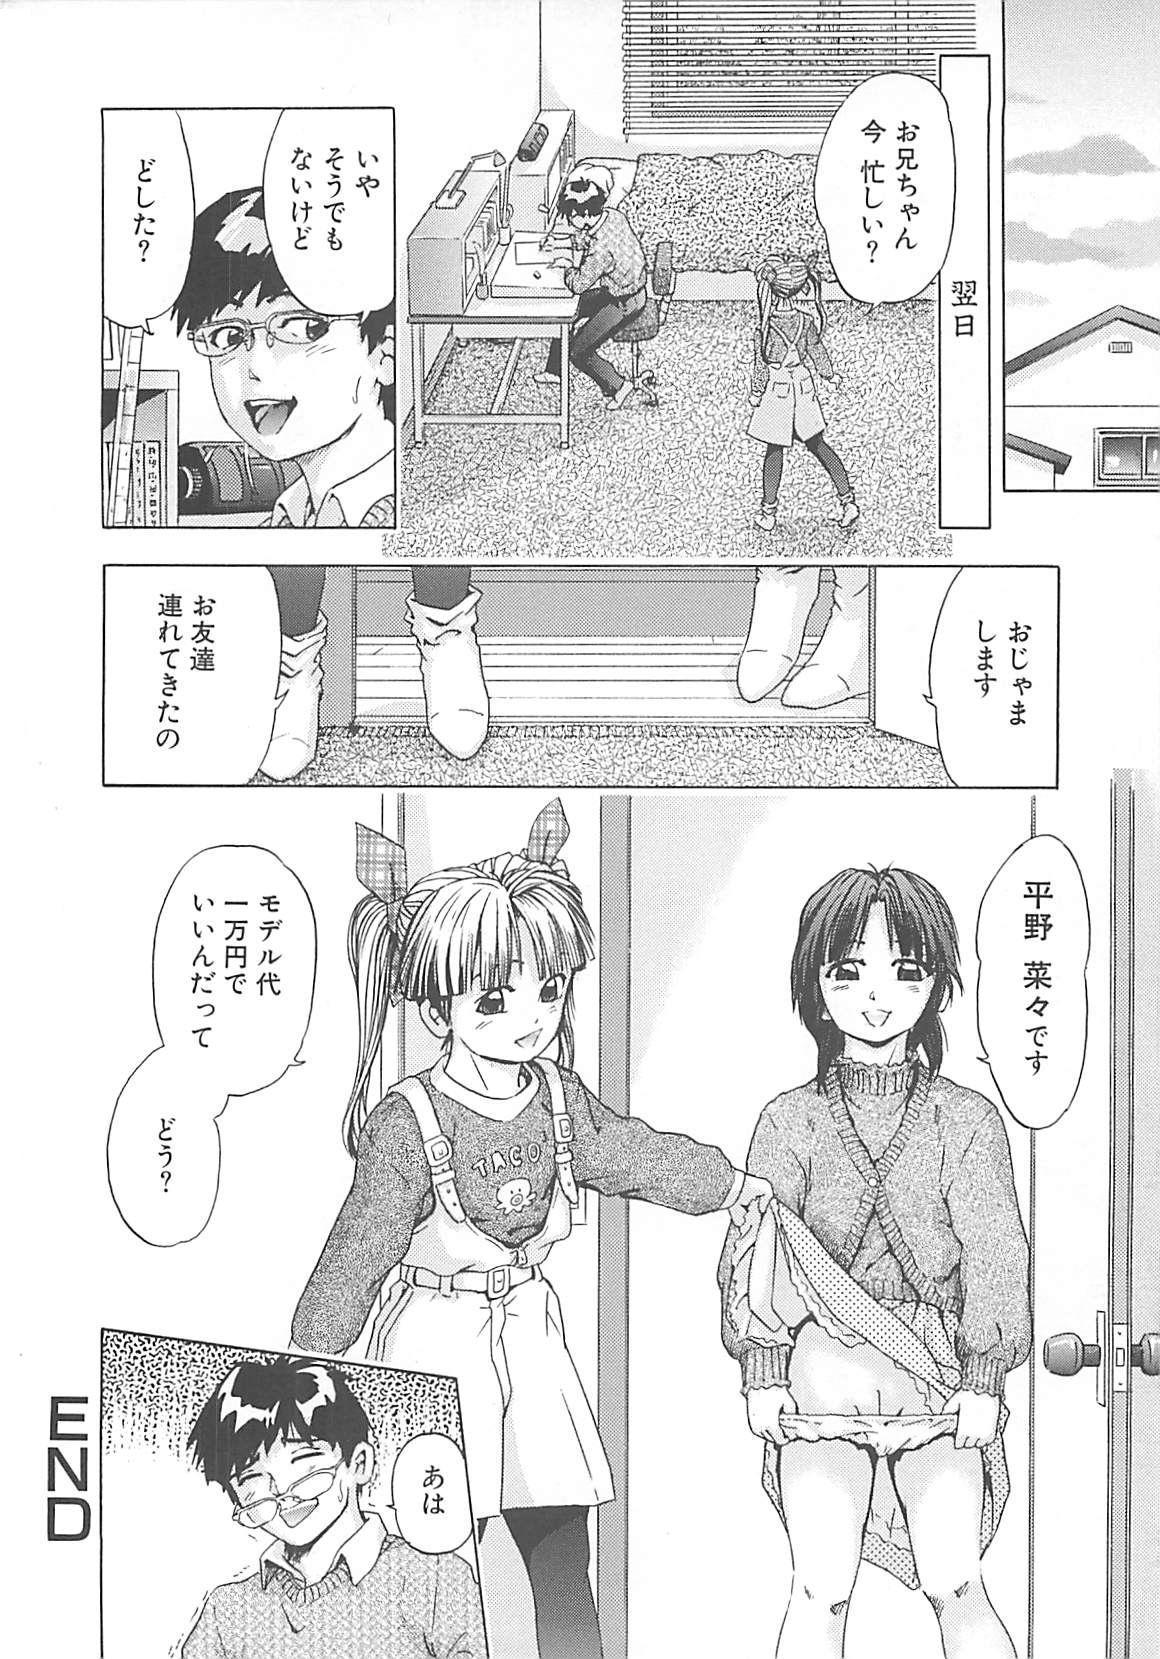 Kanin Kyoushitsu - Adultery Classroom 18